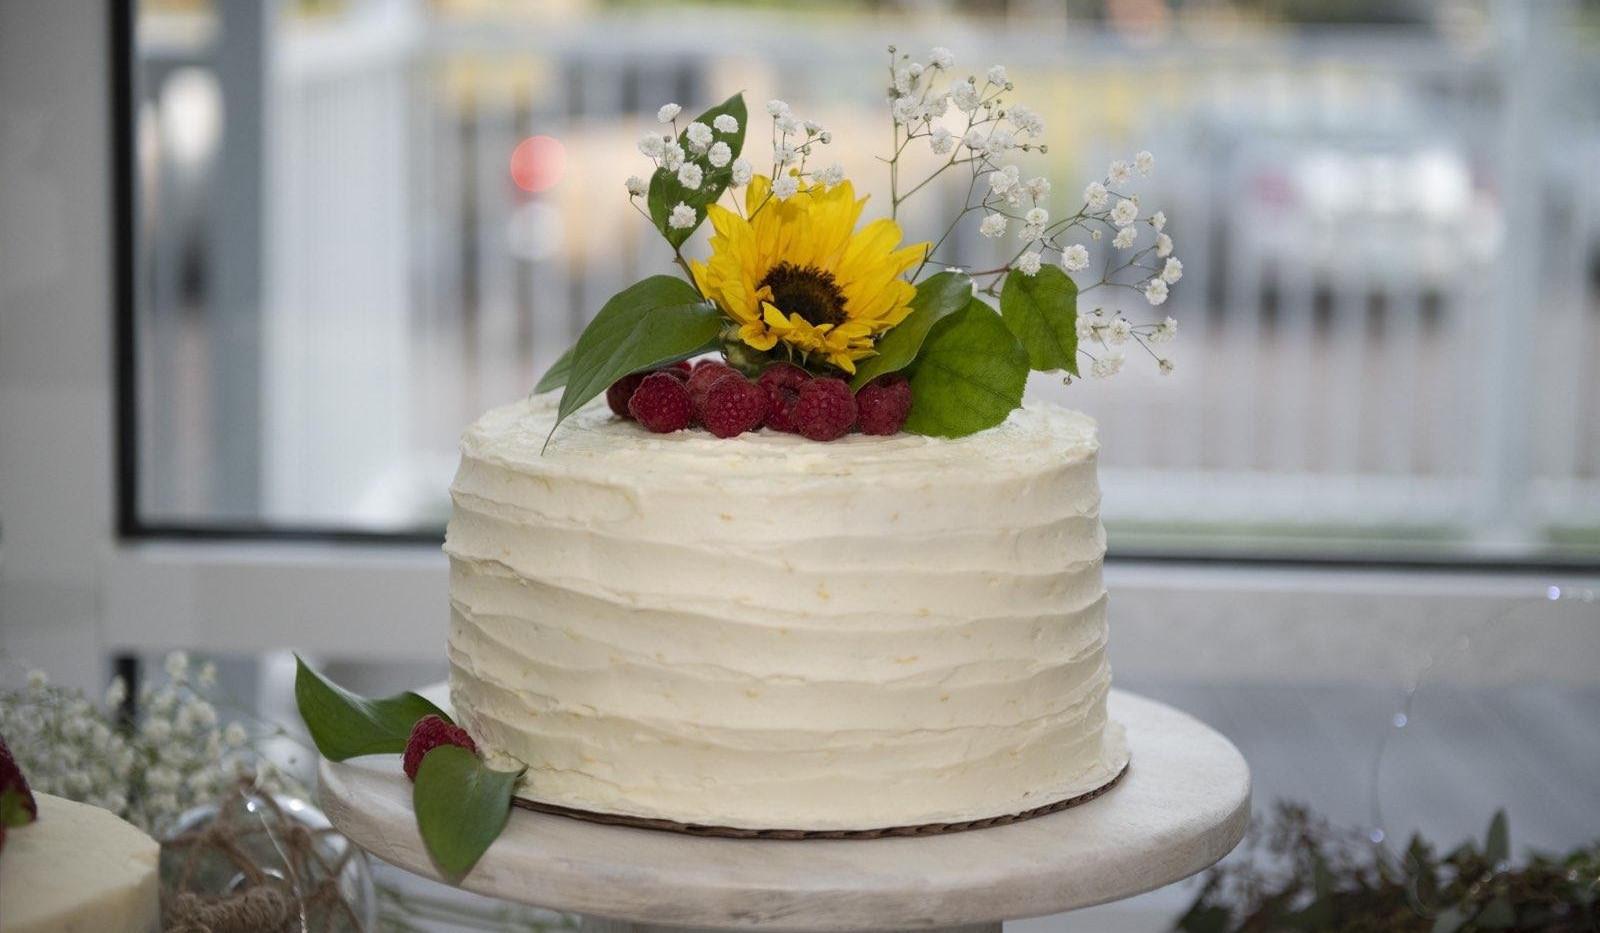 Lemon Rasberry Cake